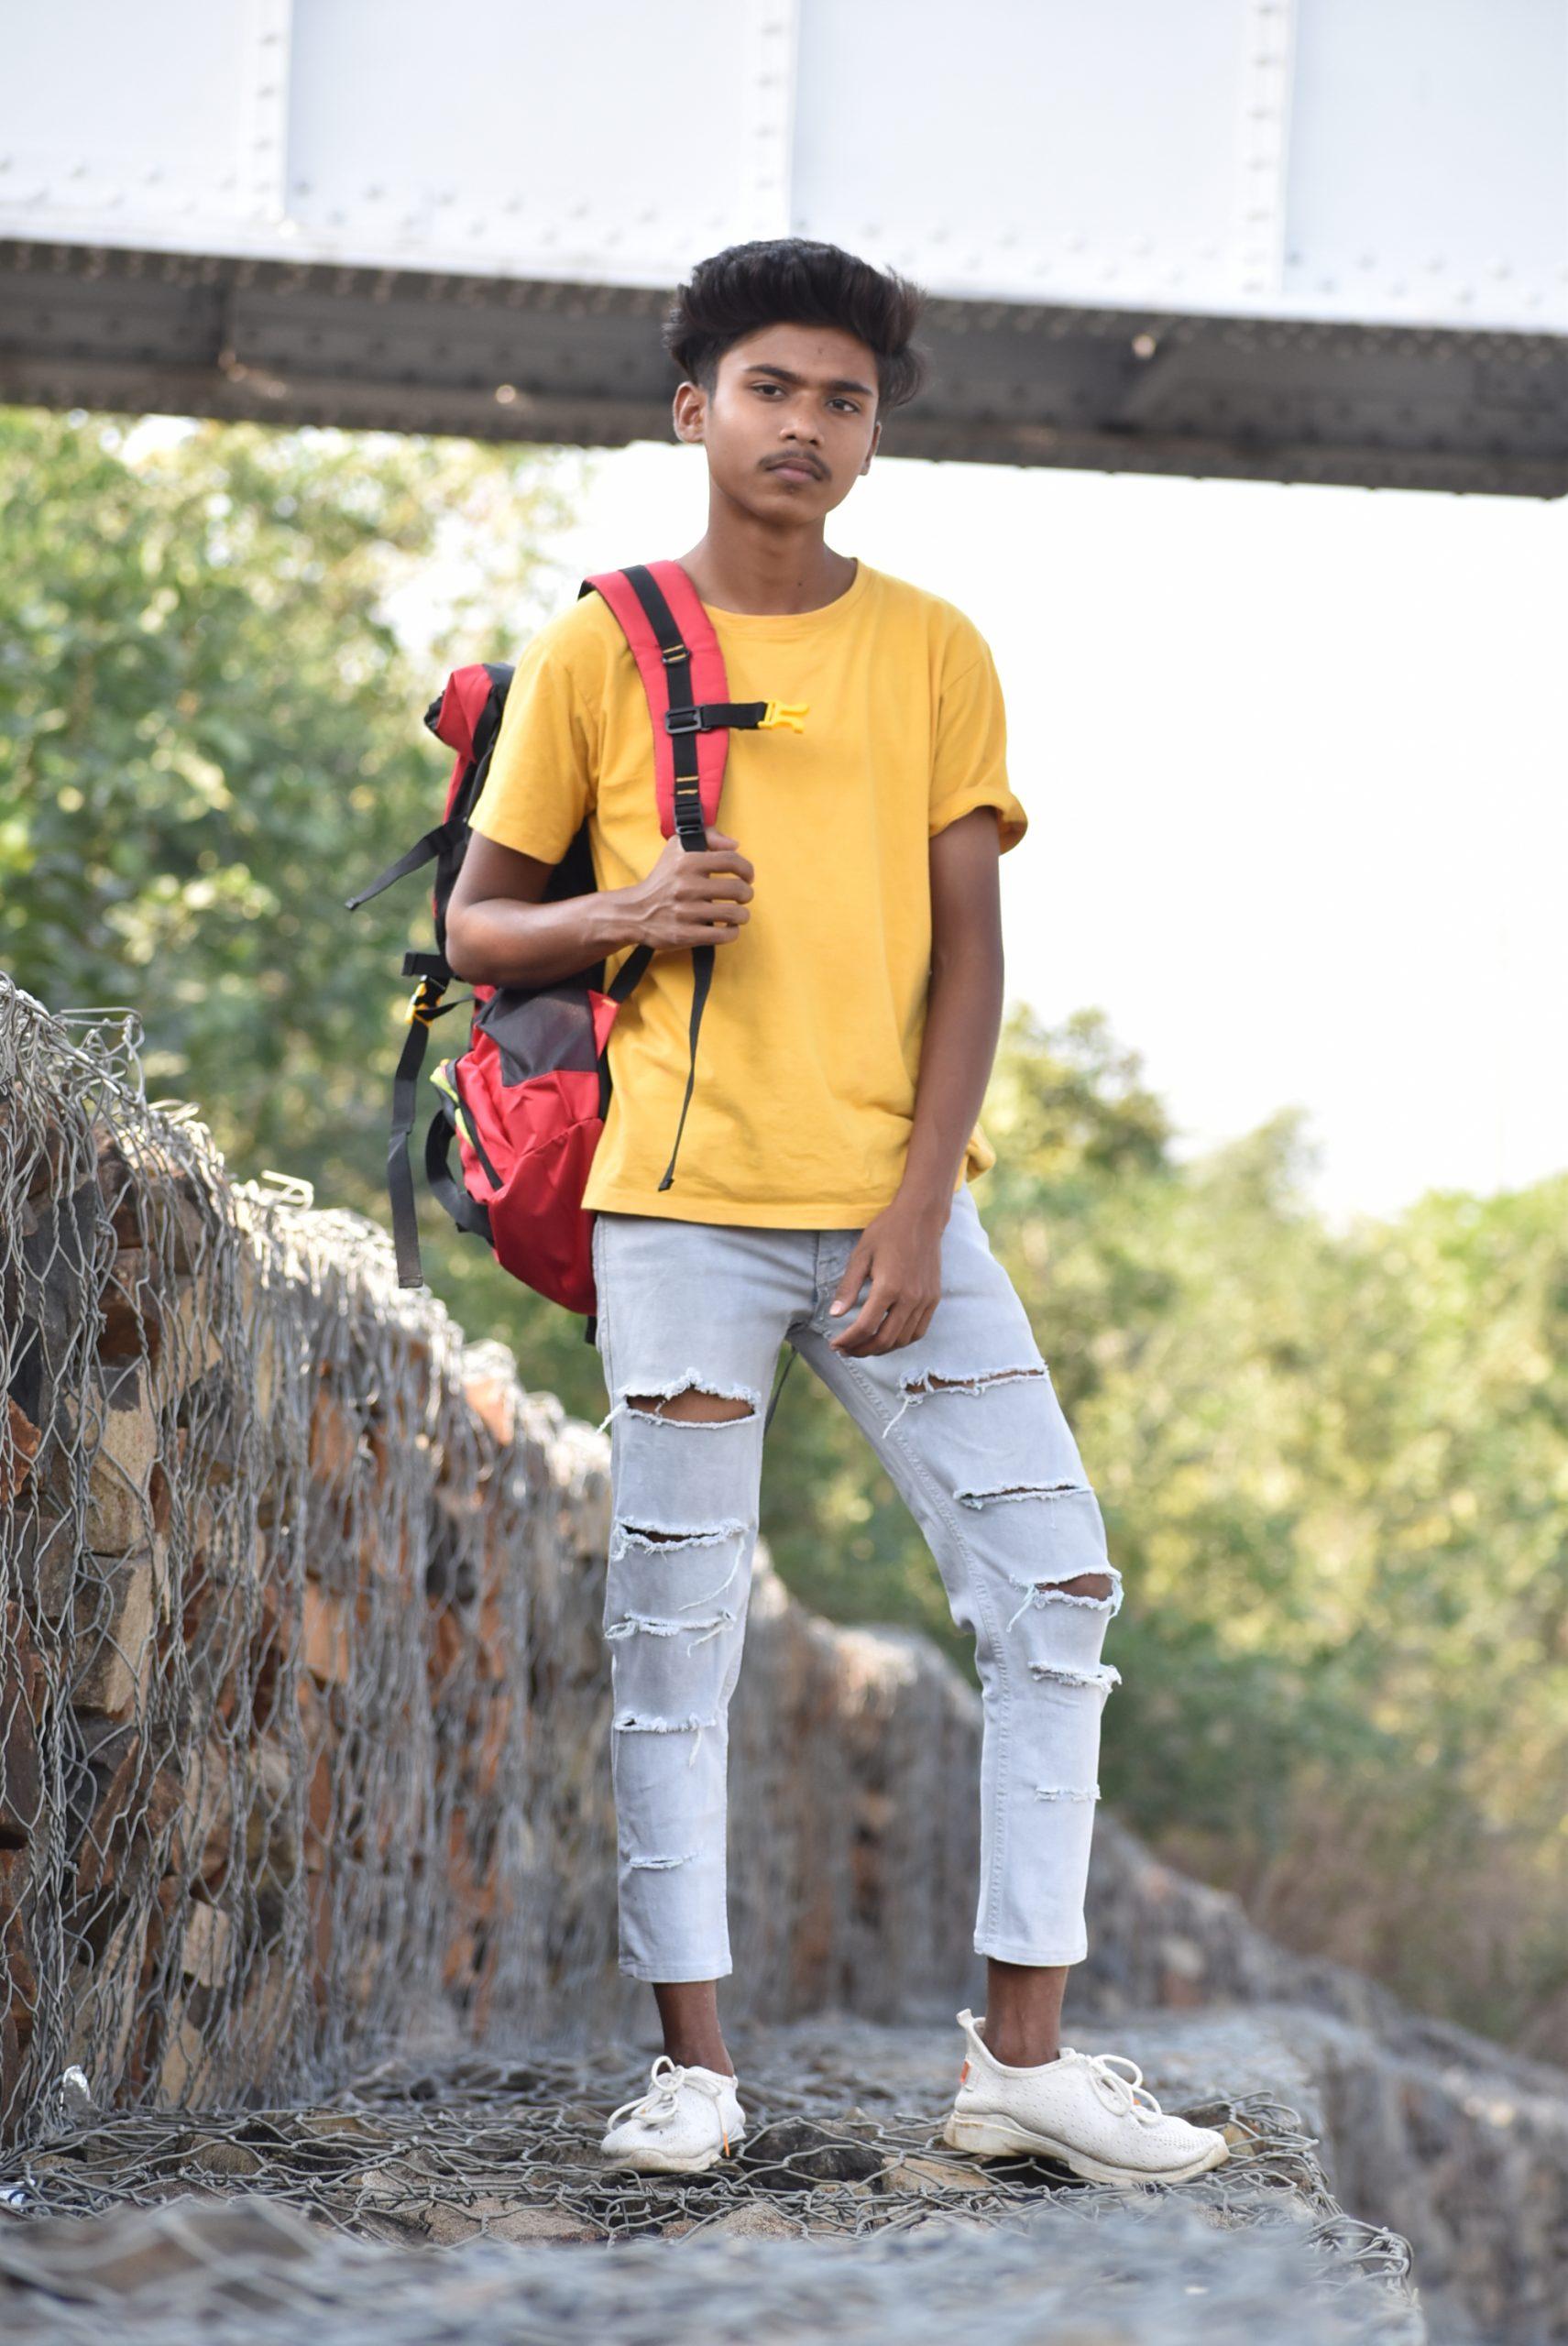 Boy posing with bag